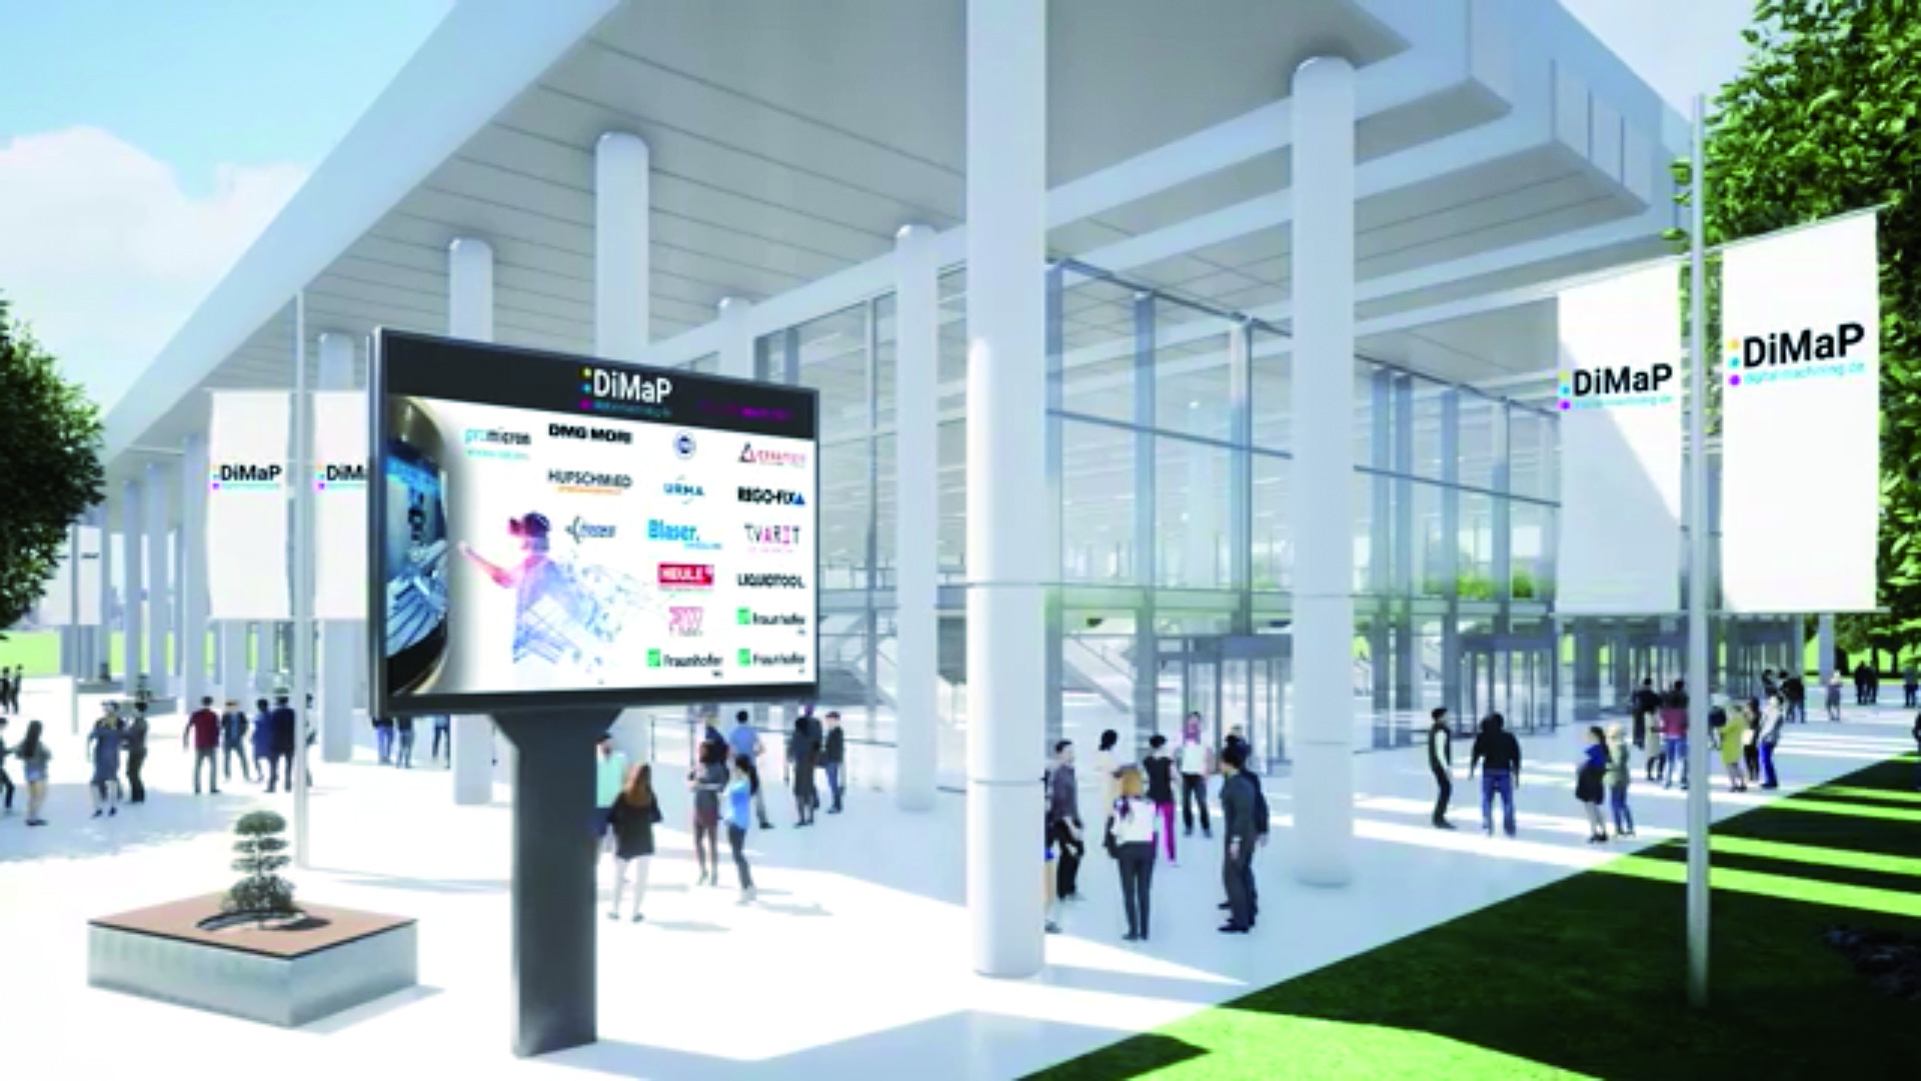 Digital Machining Market Place – DiMaP goes hybrid